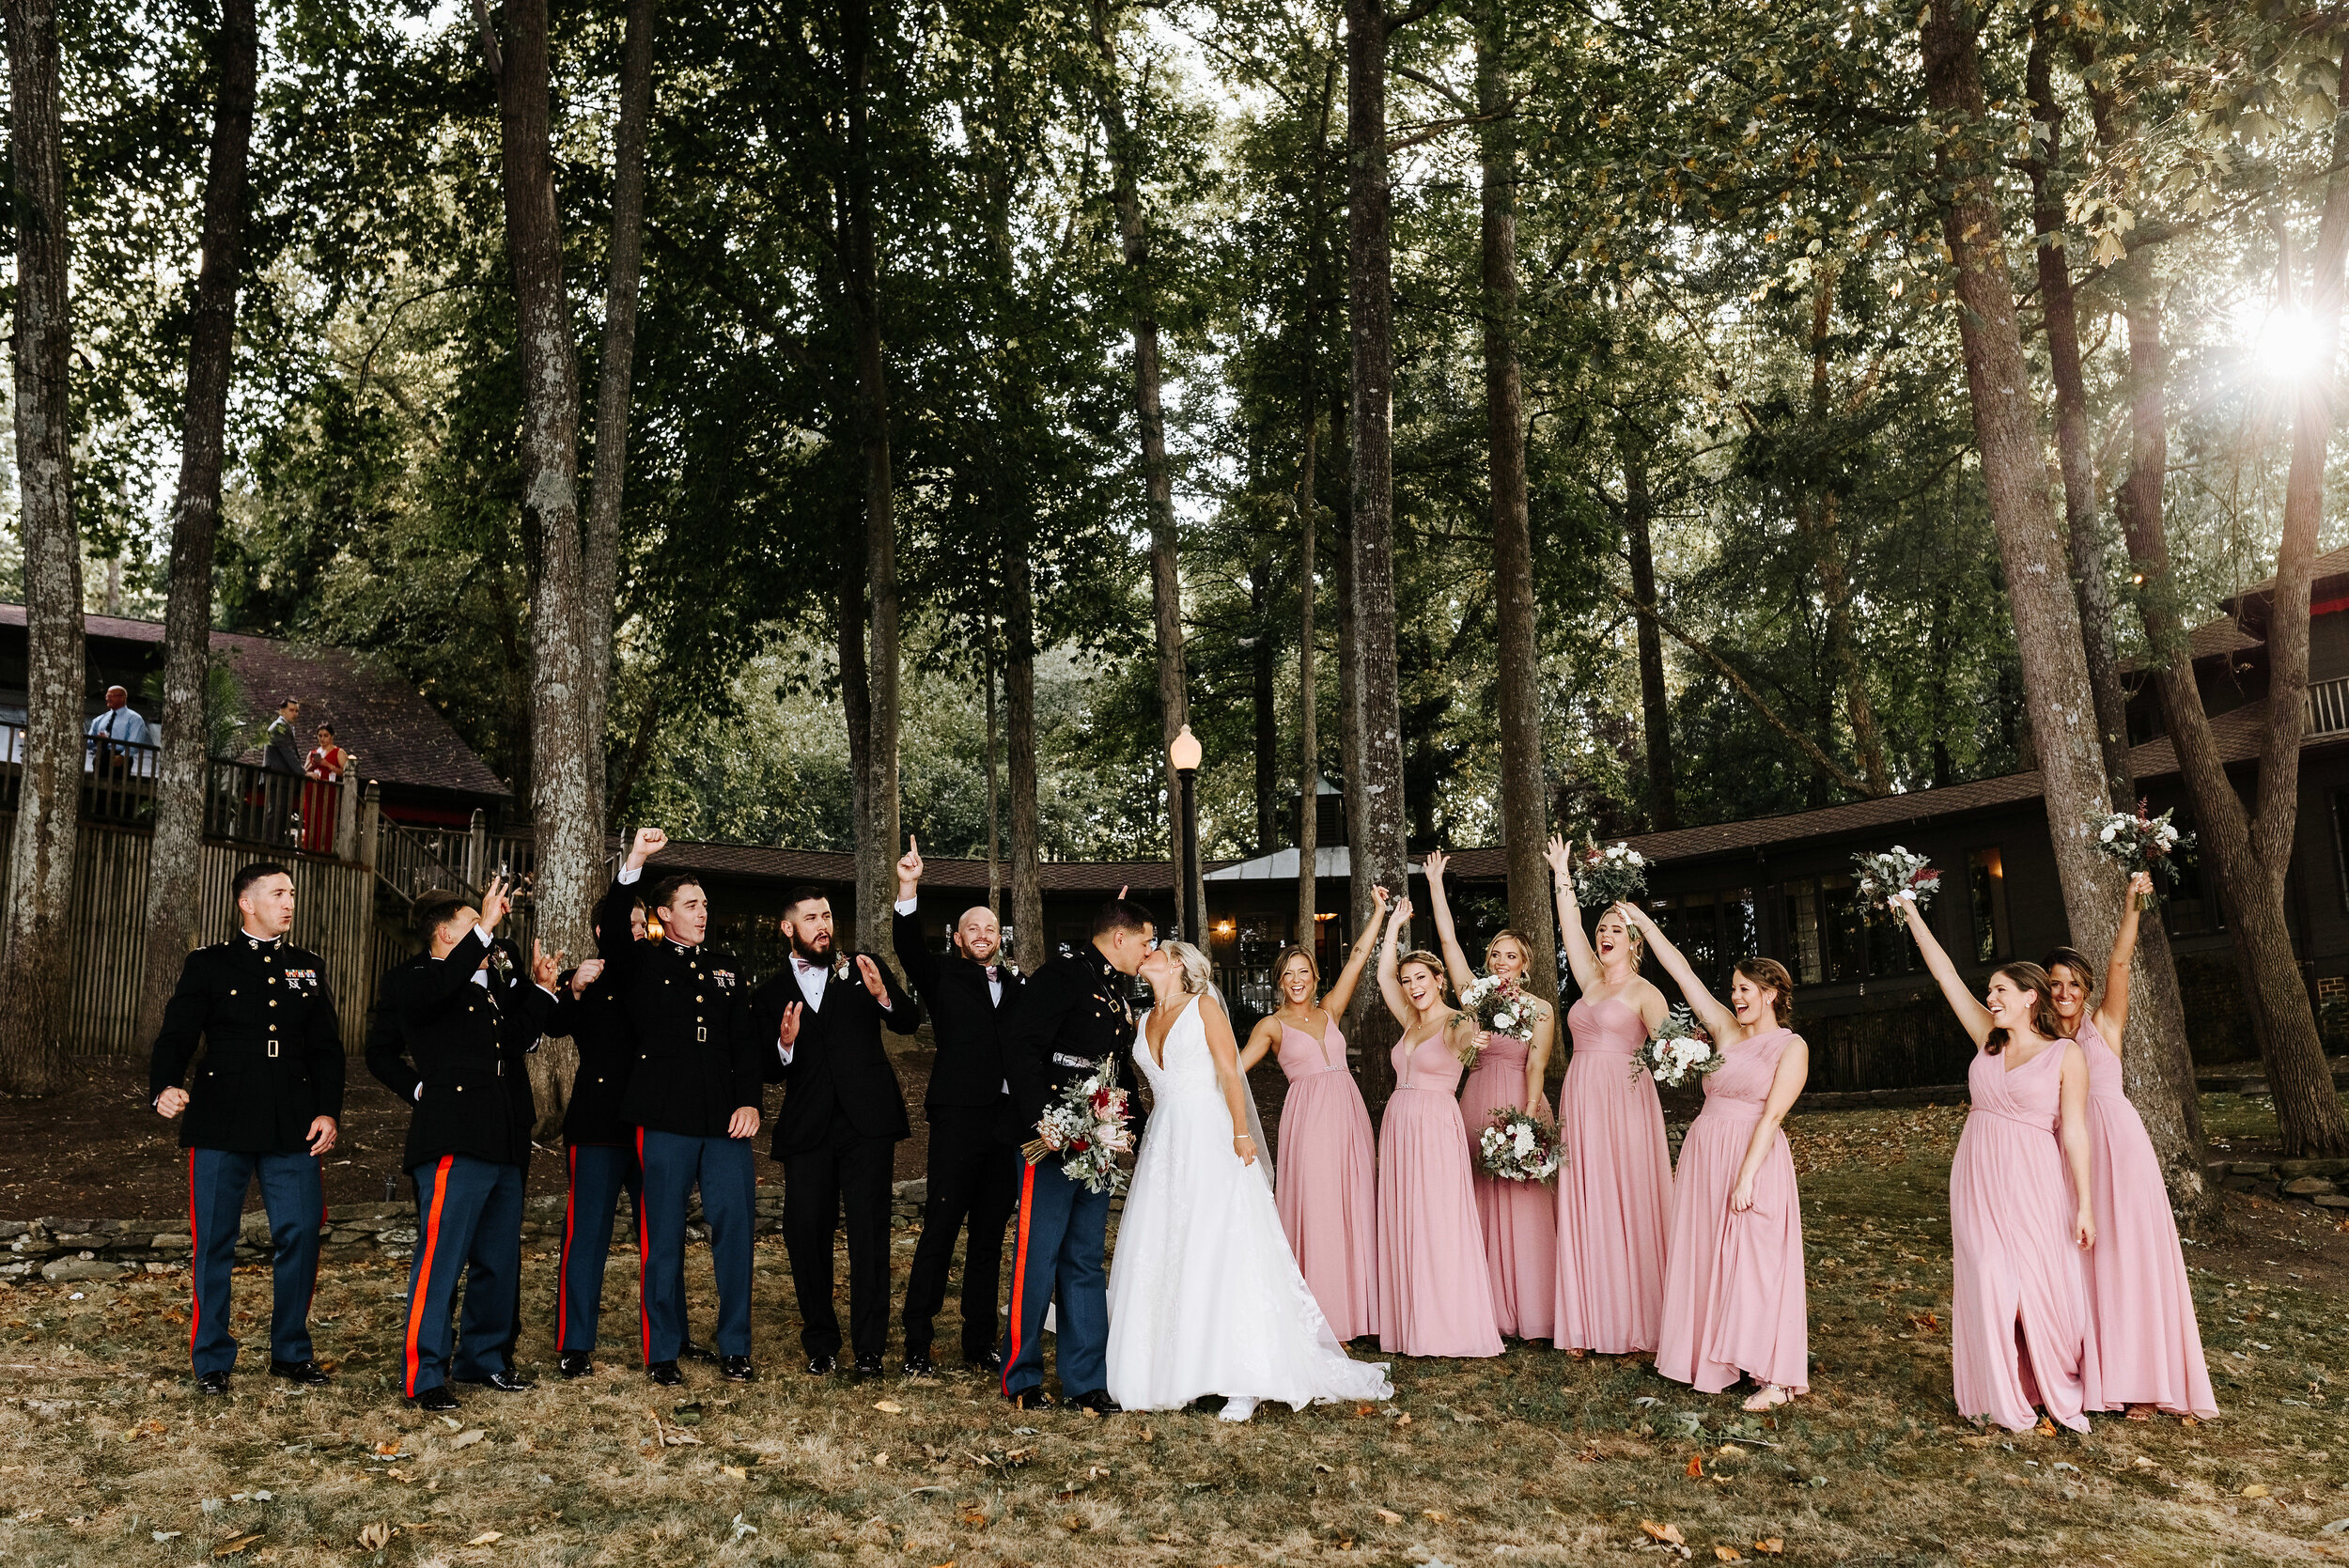 Emily_Mike_Wedding_Celebrations_at_the_Reservoir_Pool_Pavilion_Richmond_Virginia_Wedding_Photographer_Photography_by_V_61.jpg